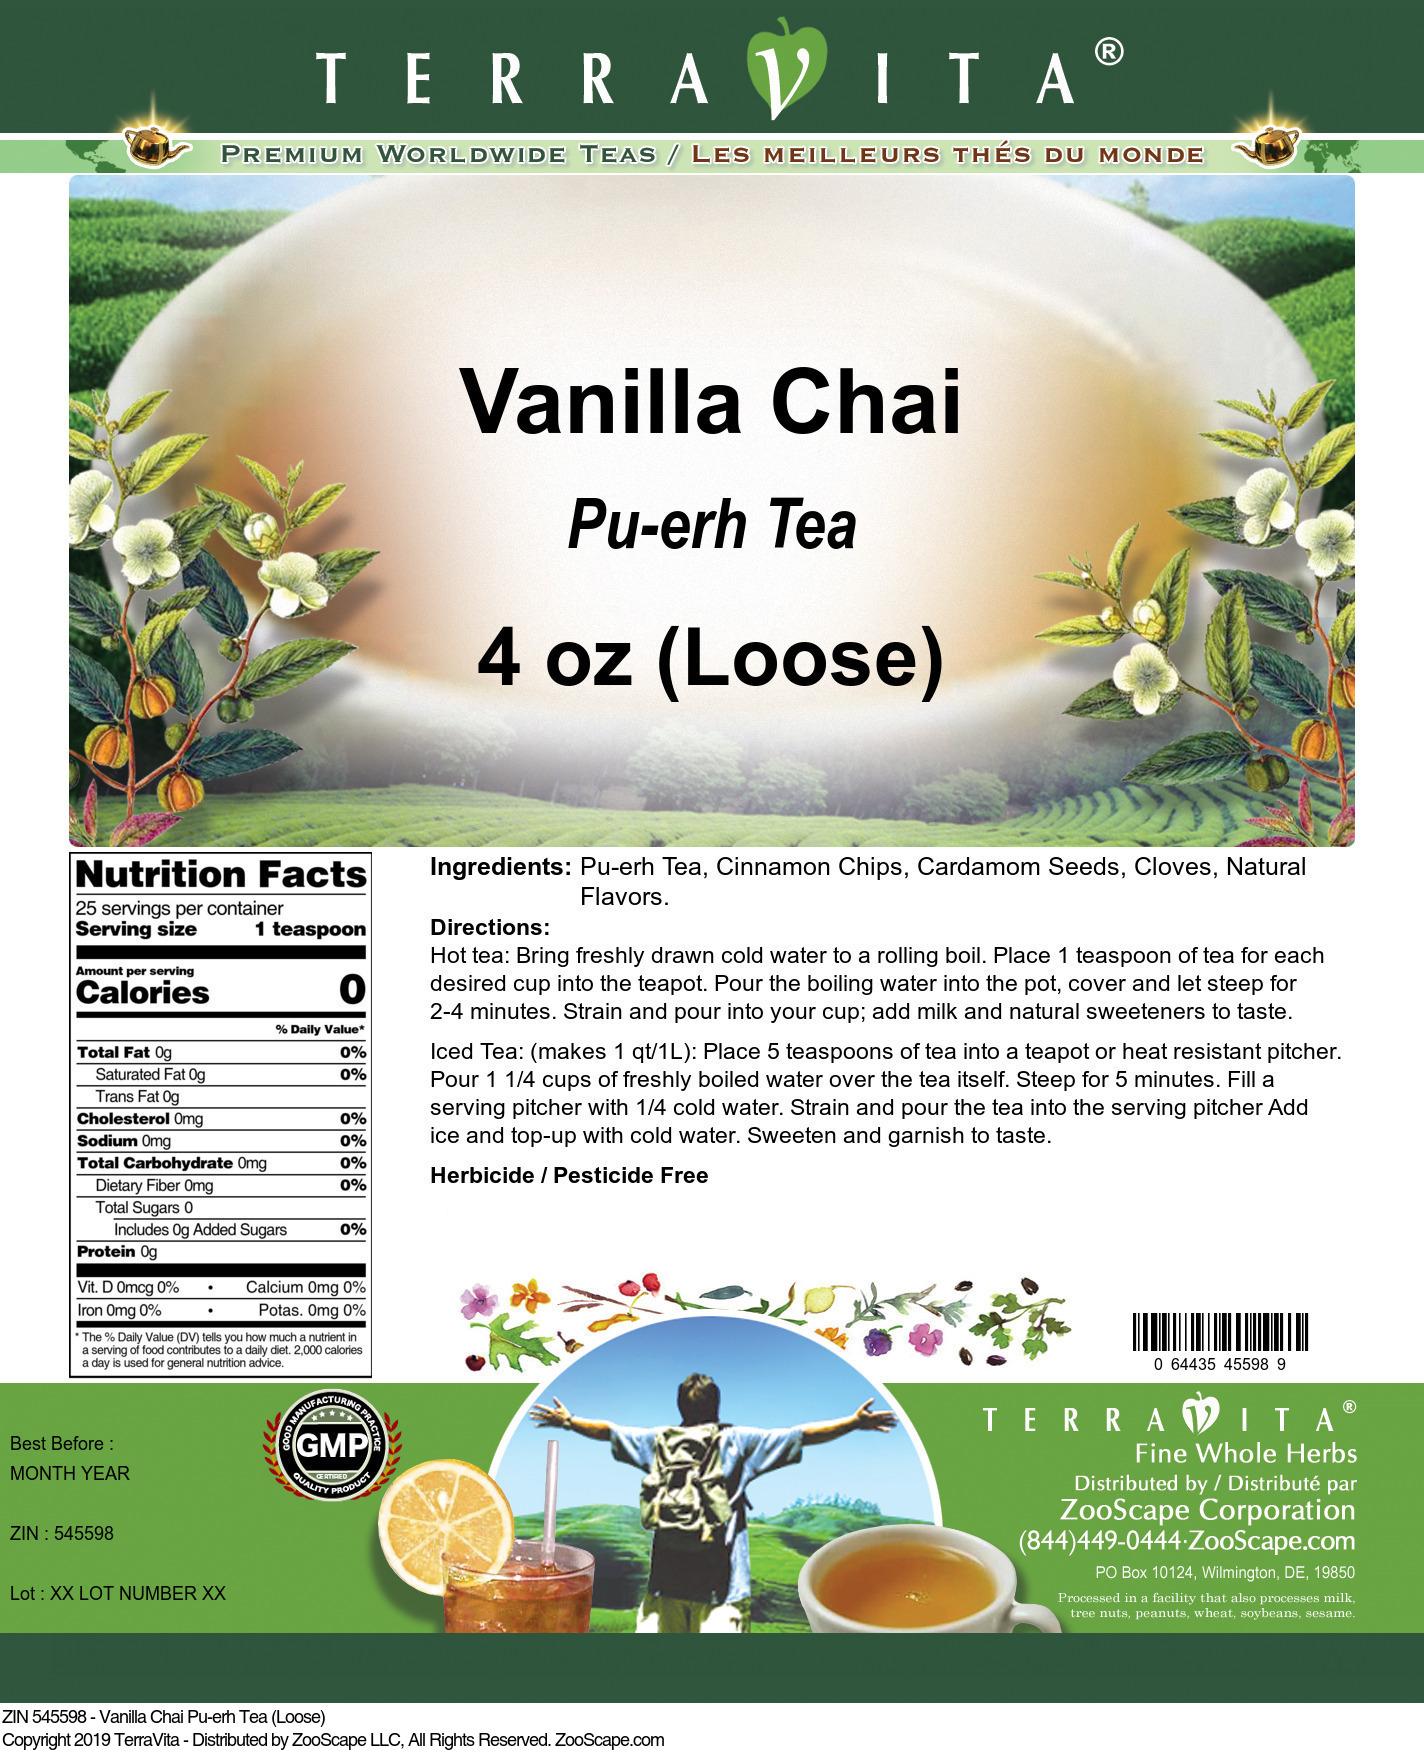 Vanilla Chai Pu-erh Tea (Loose)